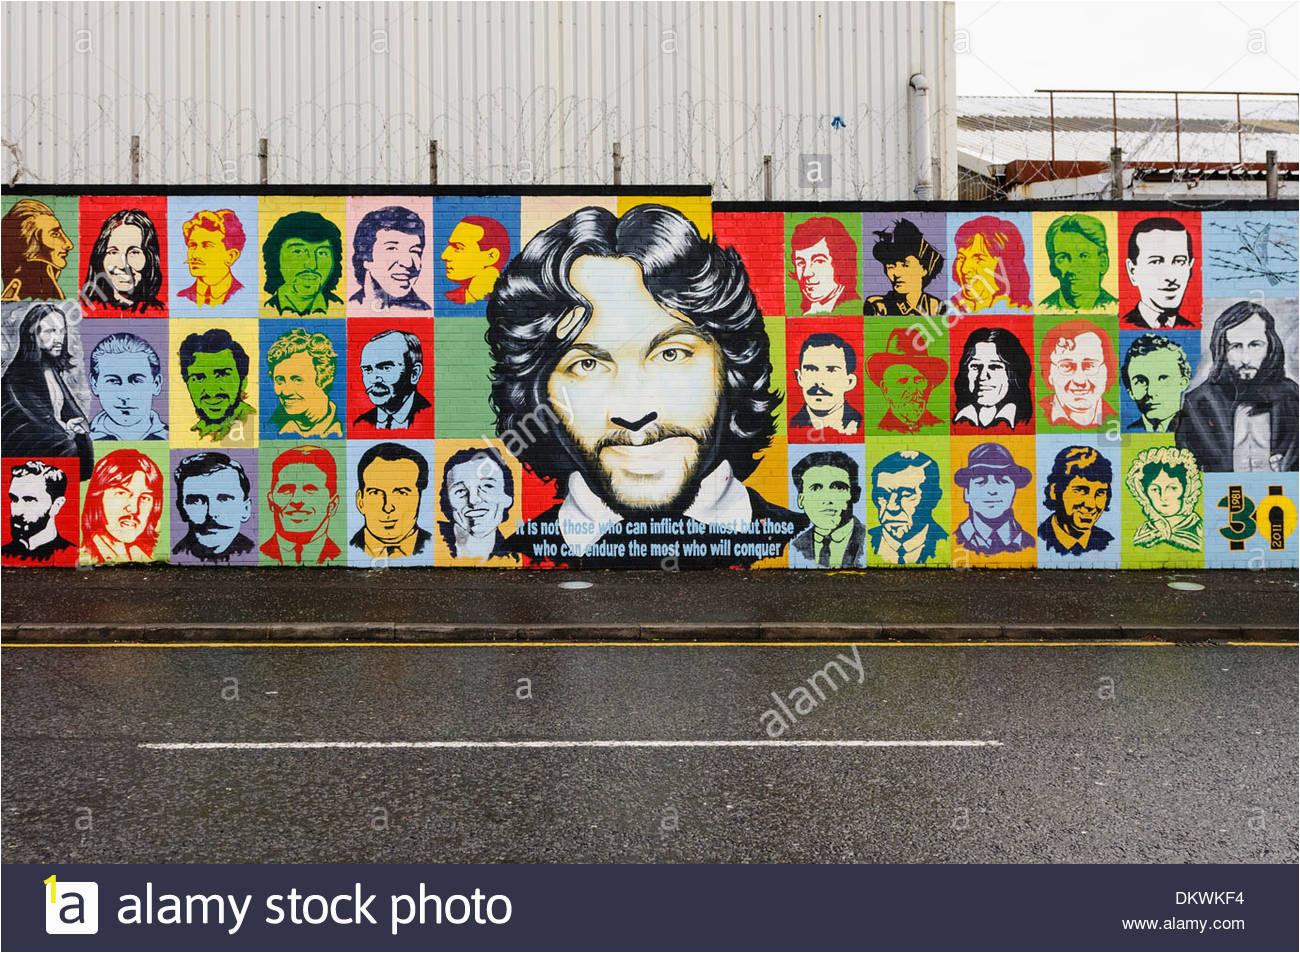 irish republican mural at the international peace wall belfast DKWKF4